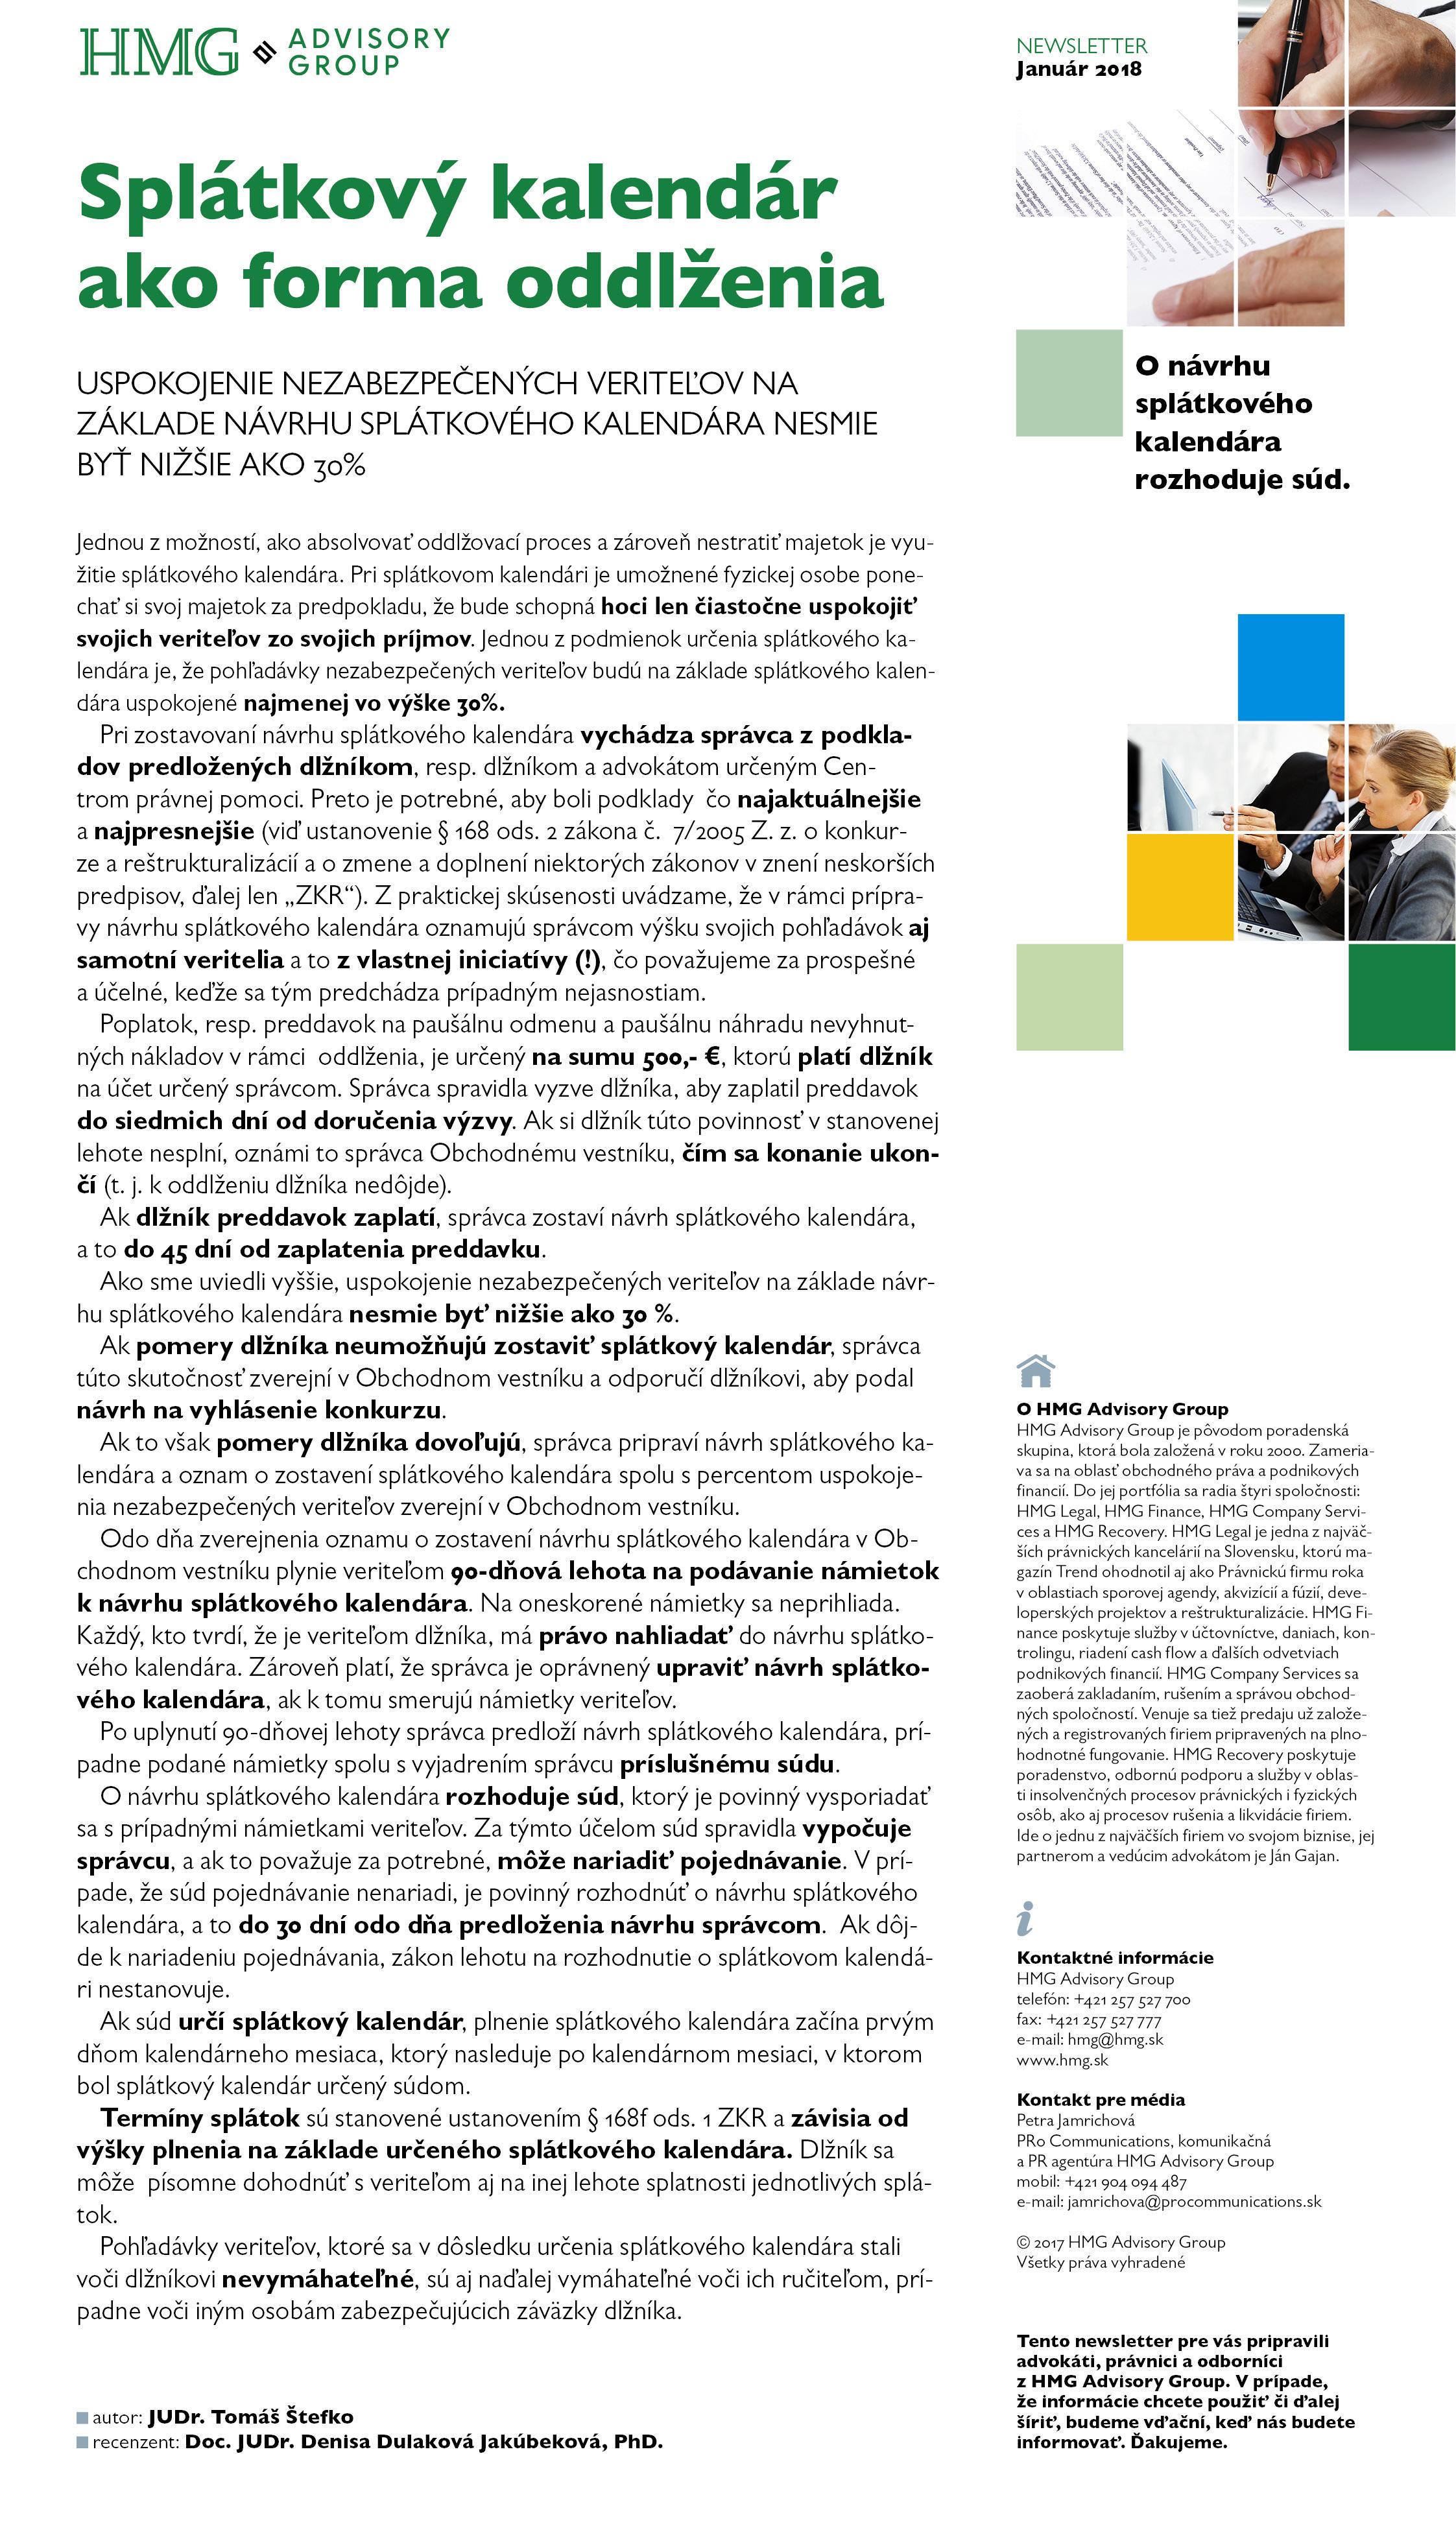 HMG_newsletter_splatkovy kalendar.jpg